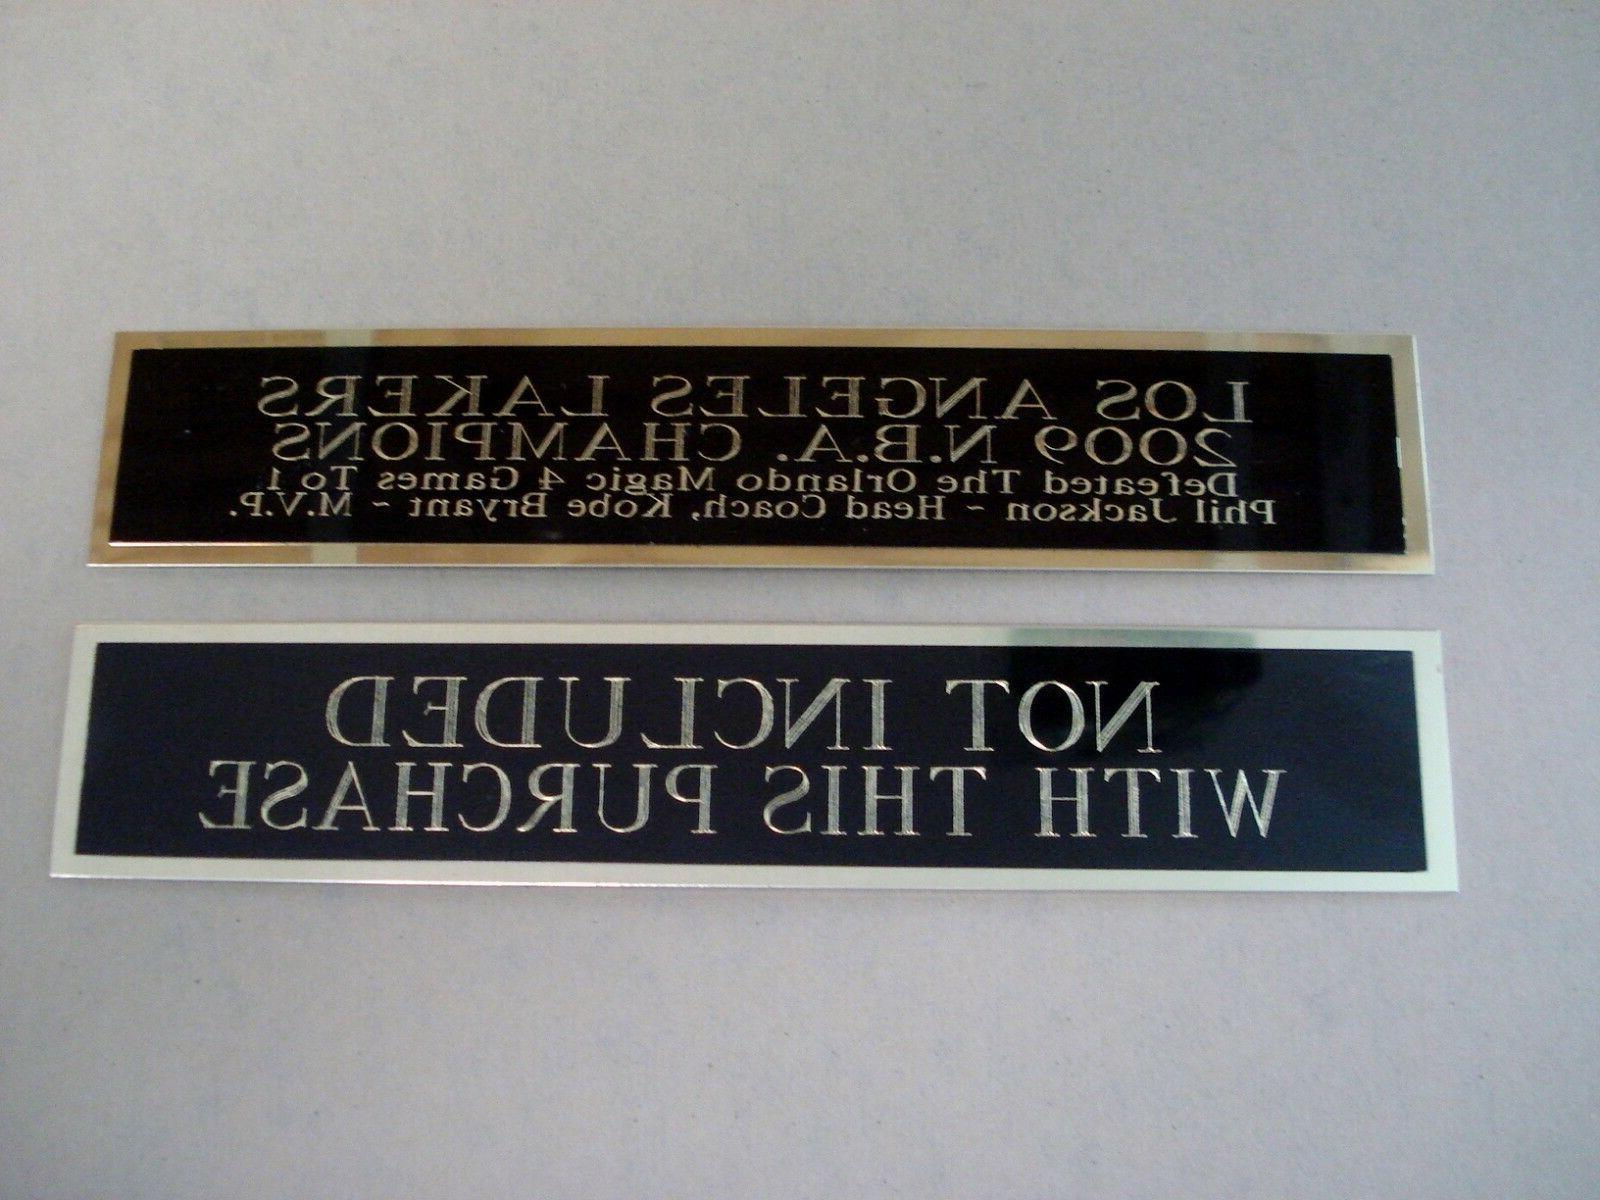 Atlanta Display Case W/ Engraved